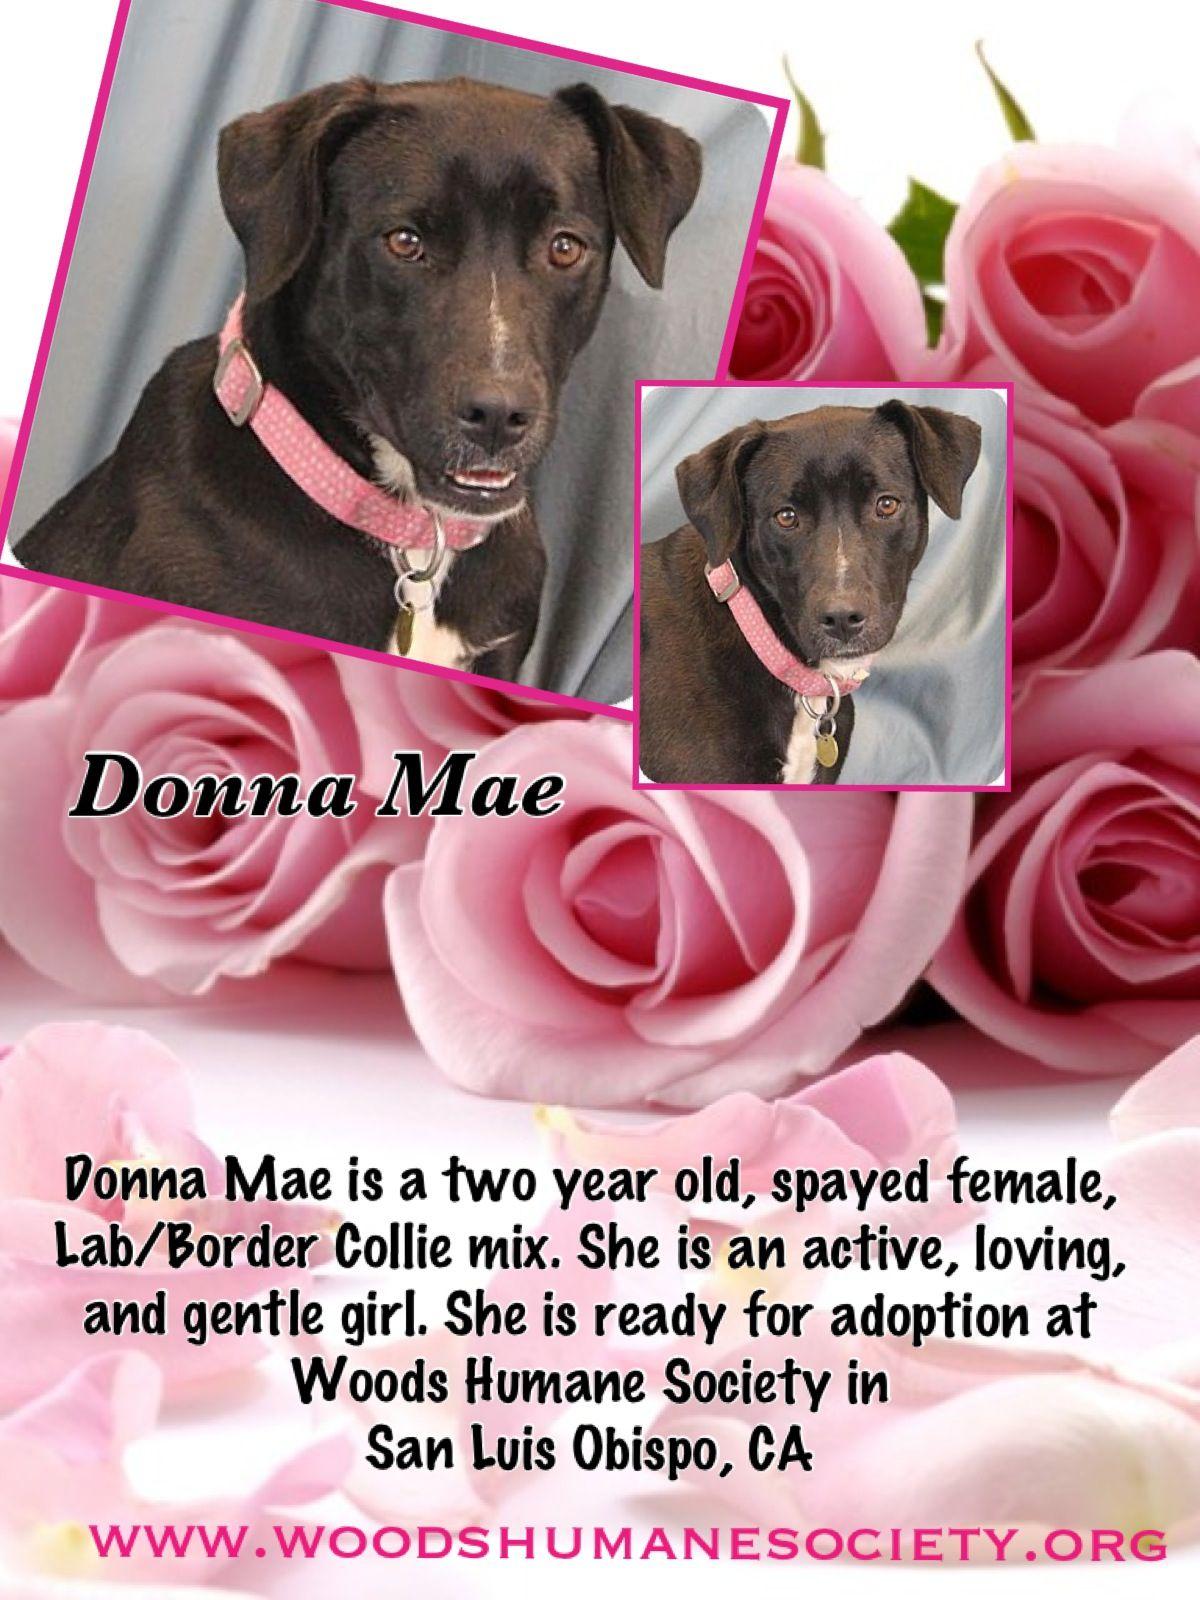 Donna Mae